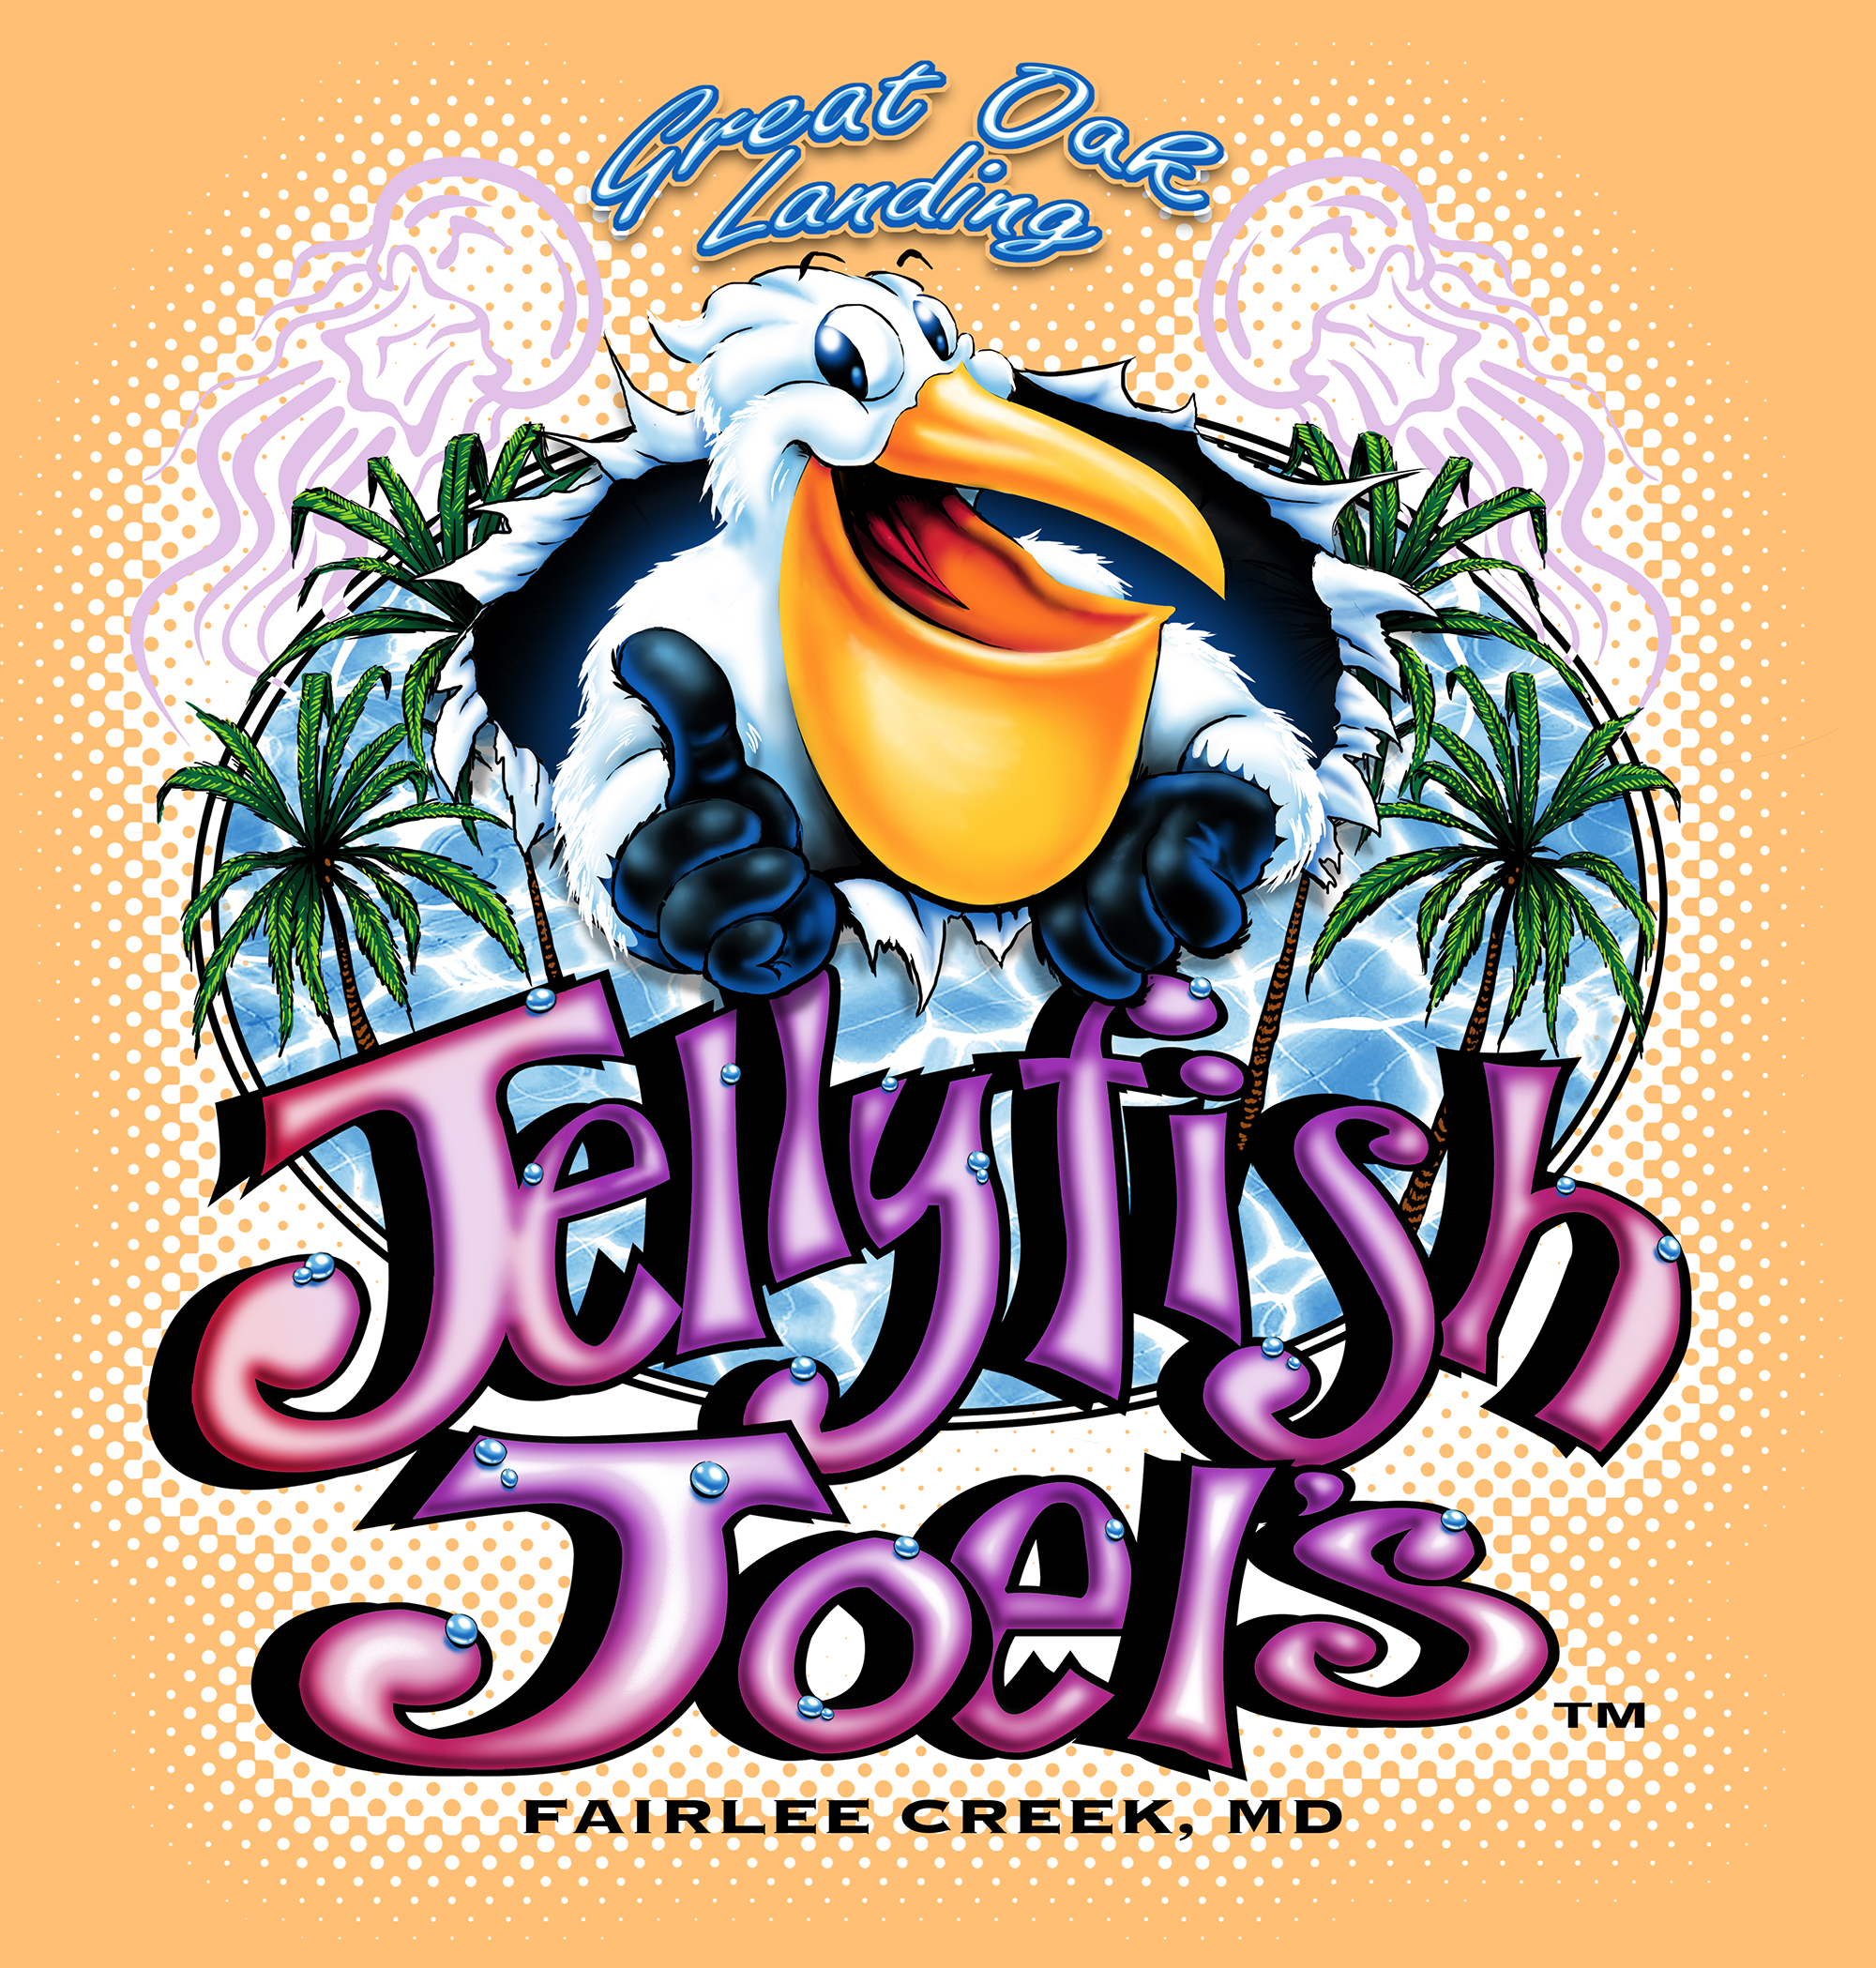 Jellyfish Joel's Pilican